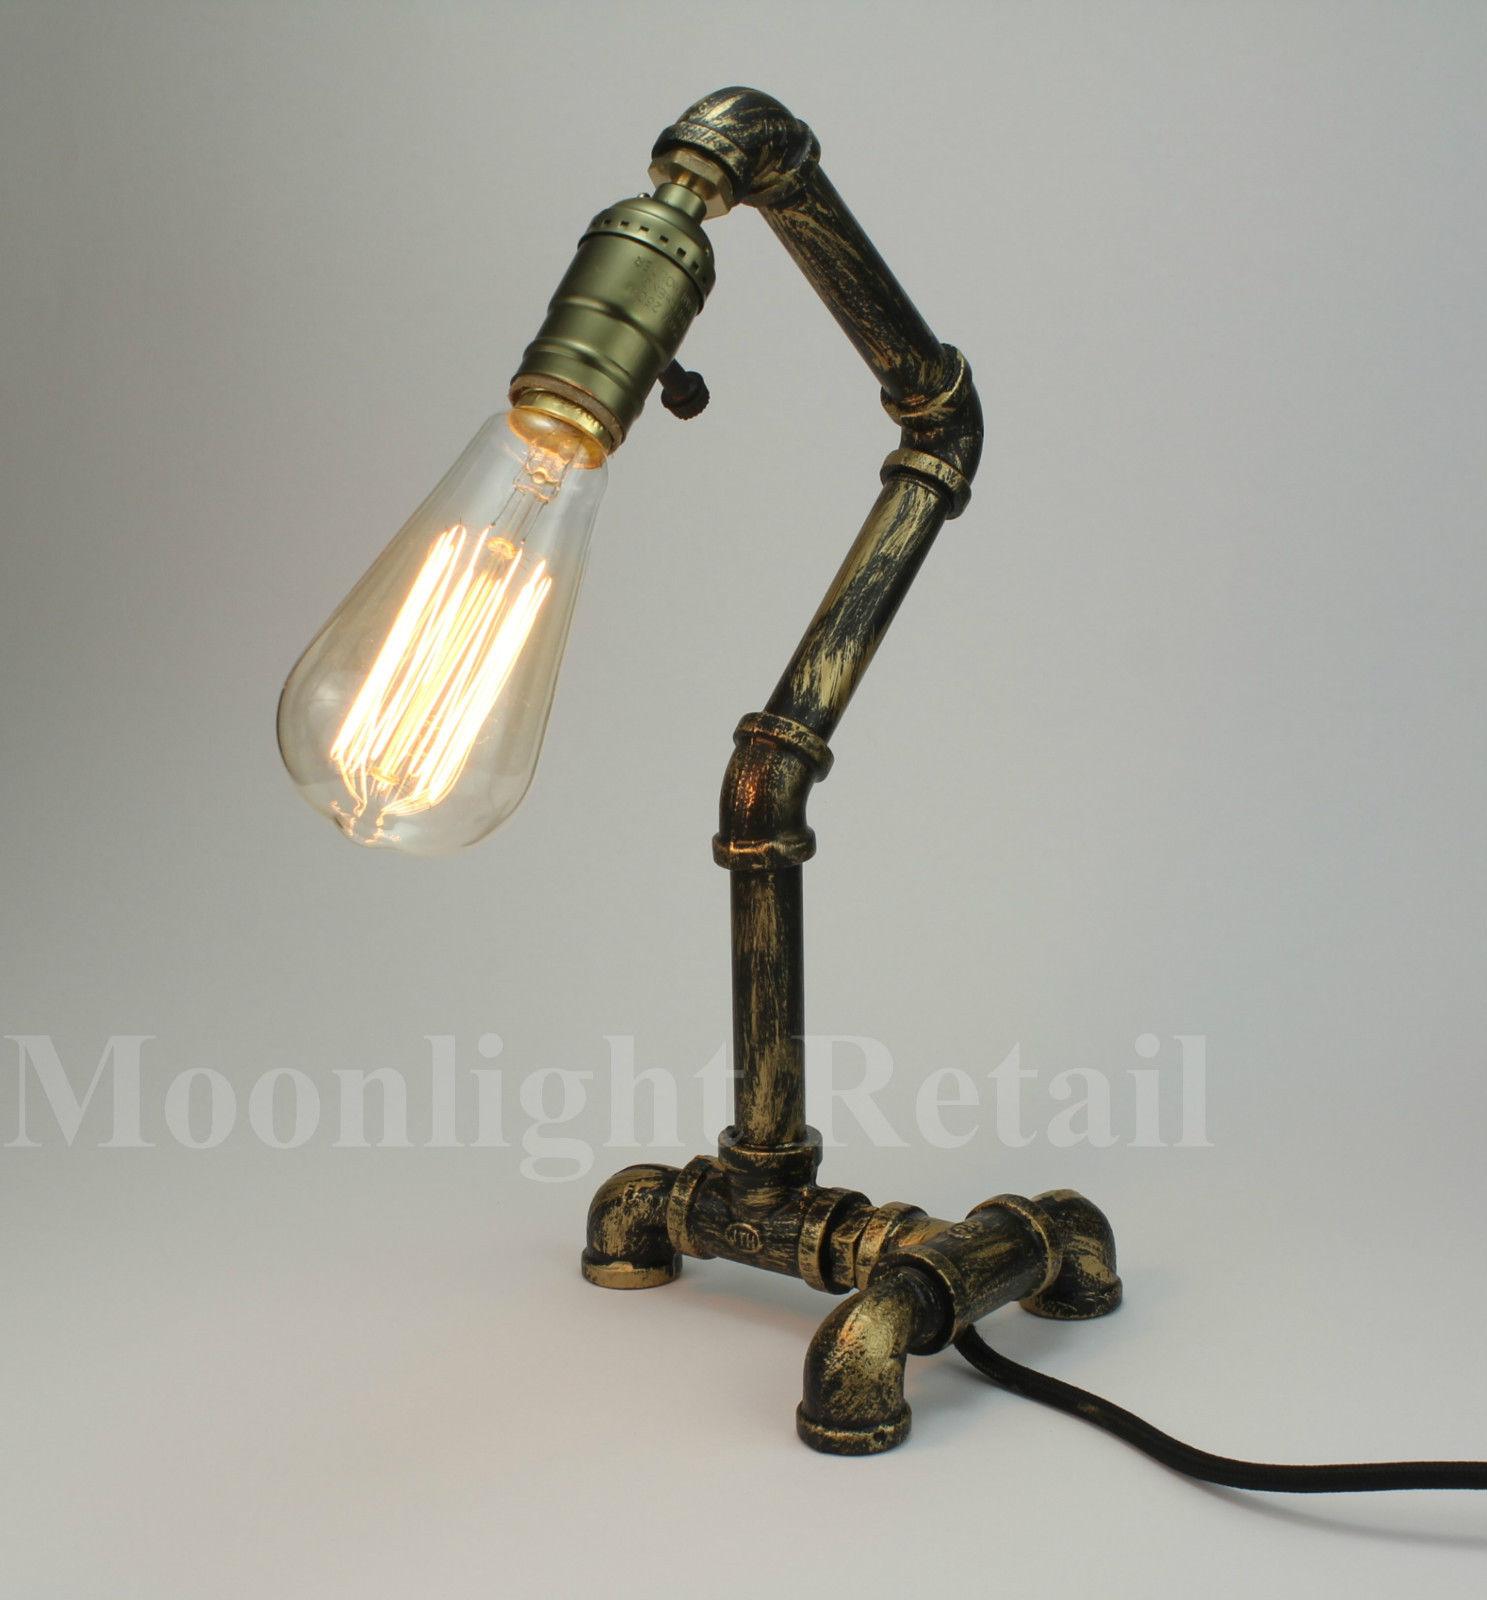 Vintage Retro Style Steel Pipe Desk Table Lamp